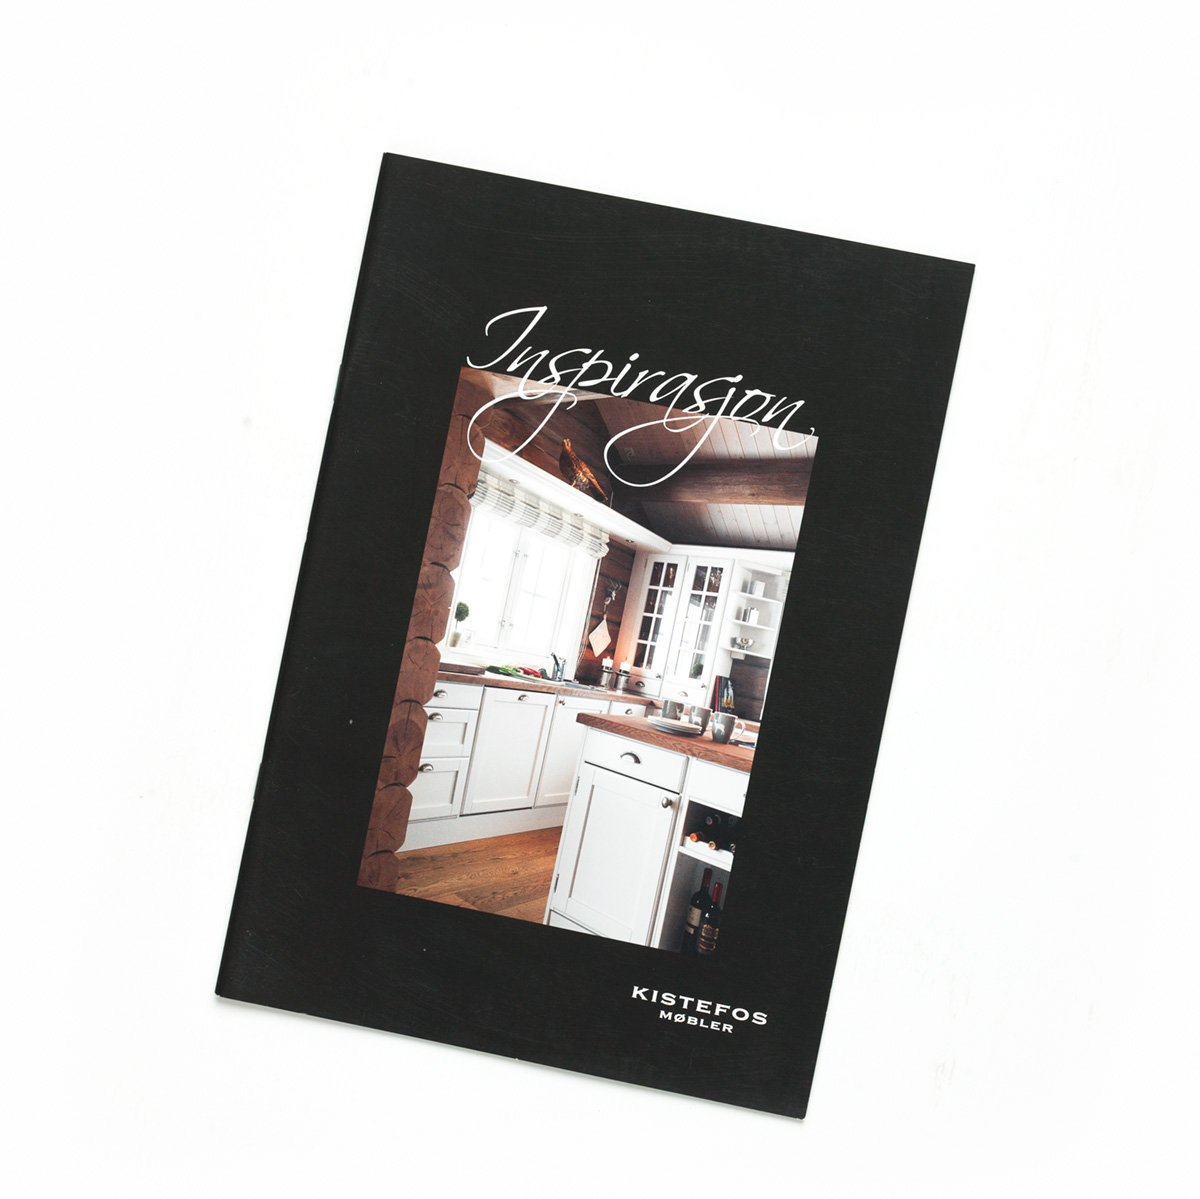 Katalog for Kistefos møbler